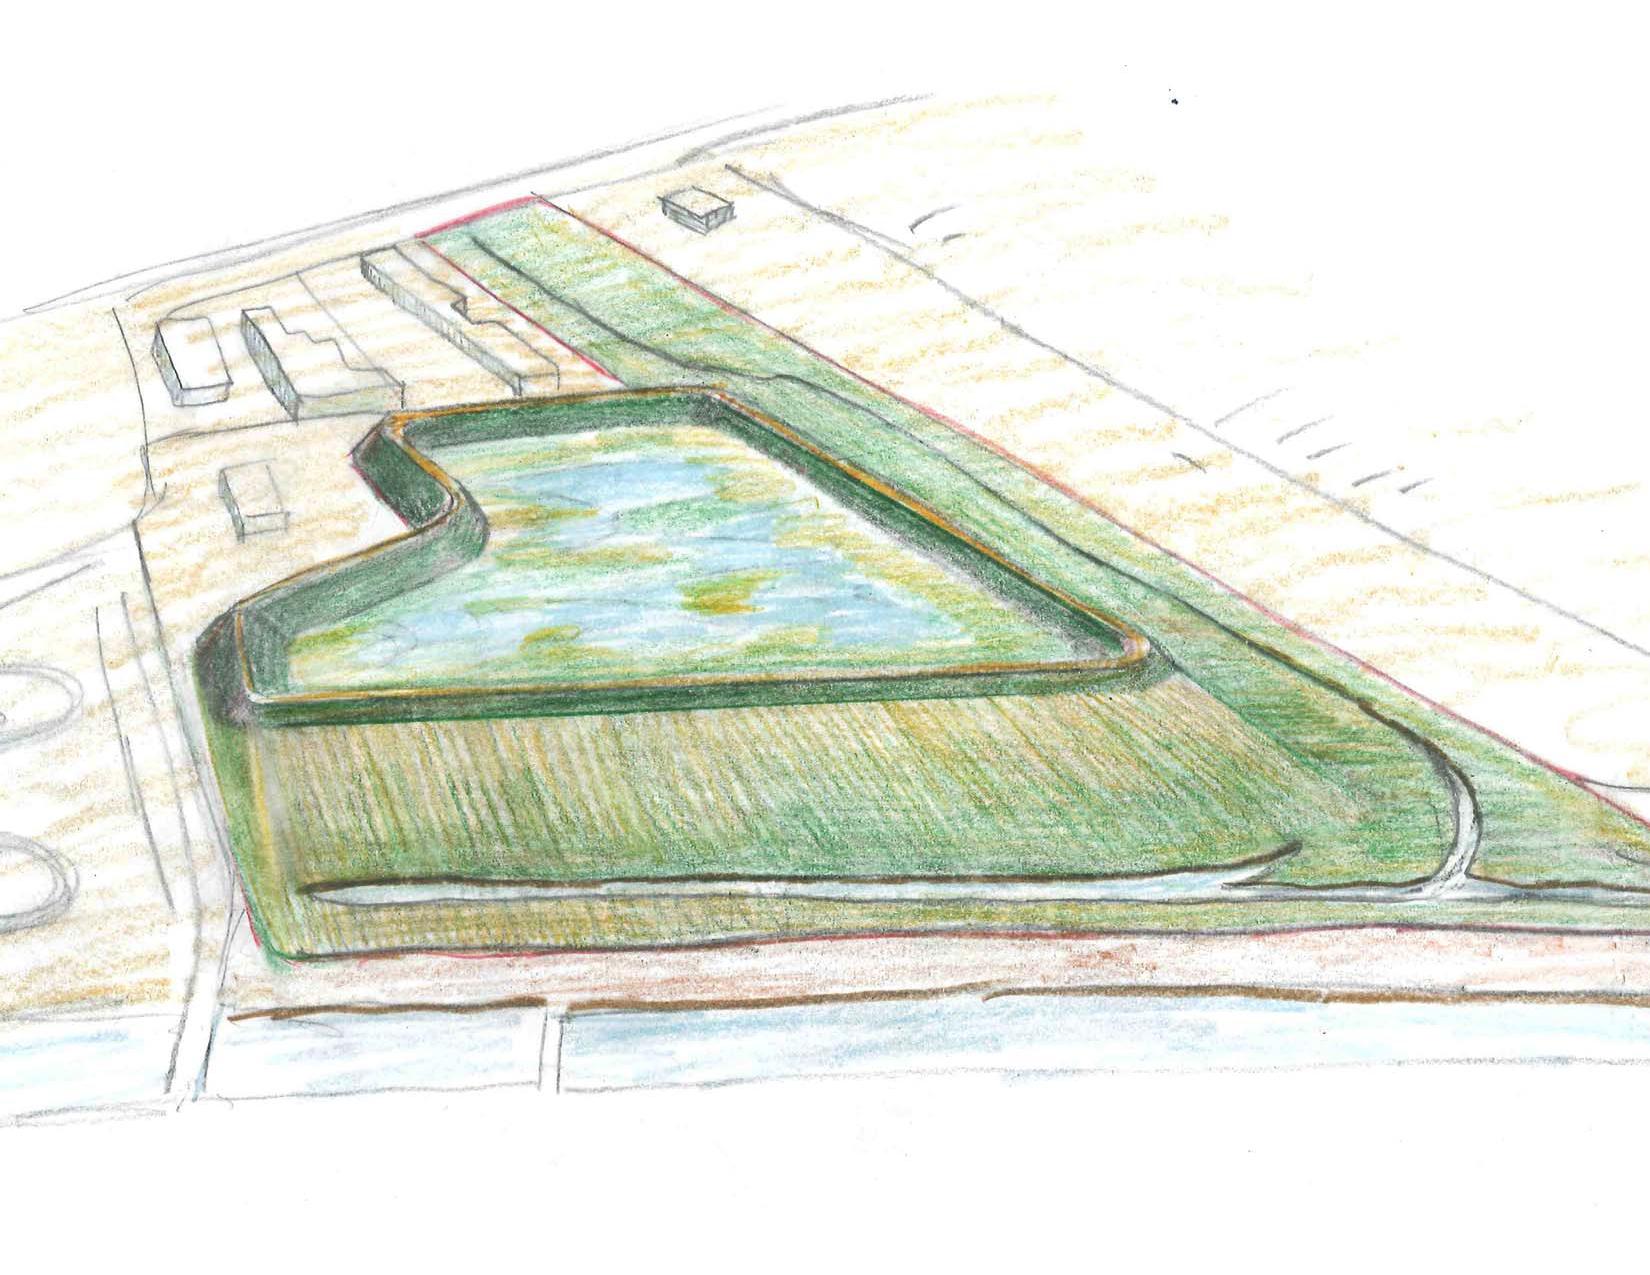 oro loma sketch plans